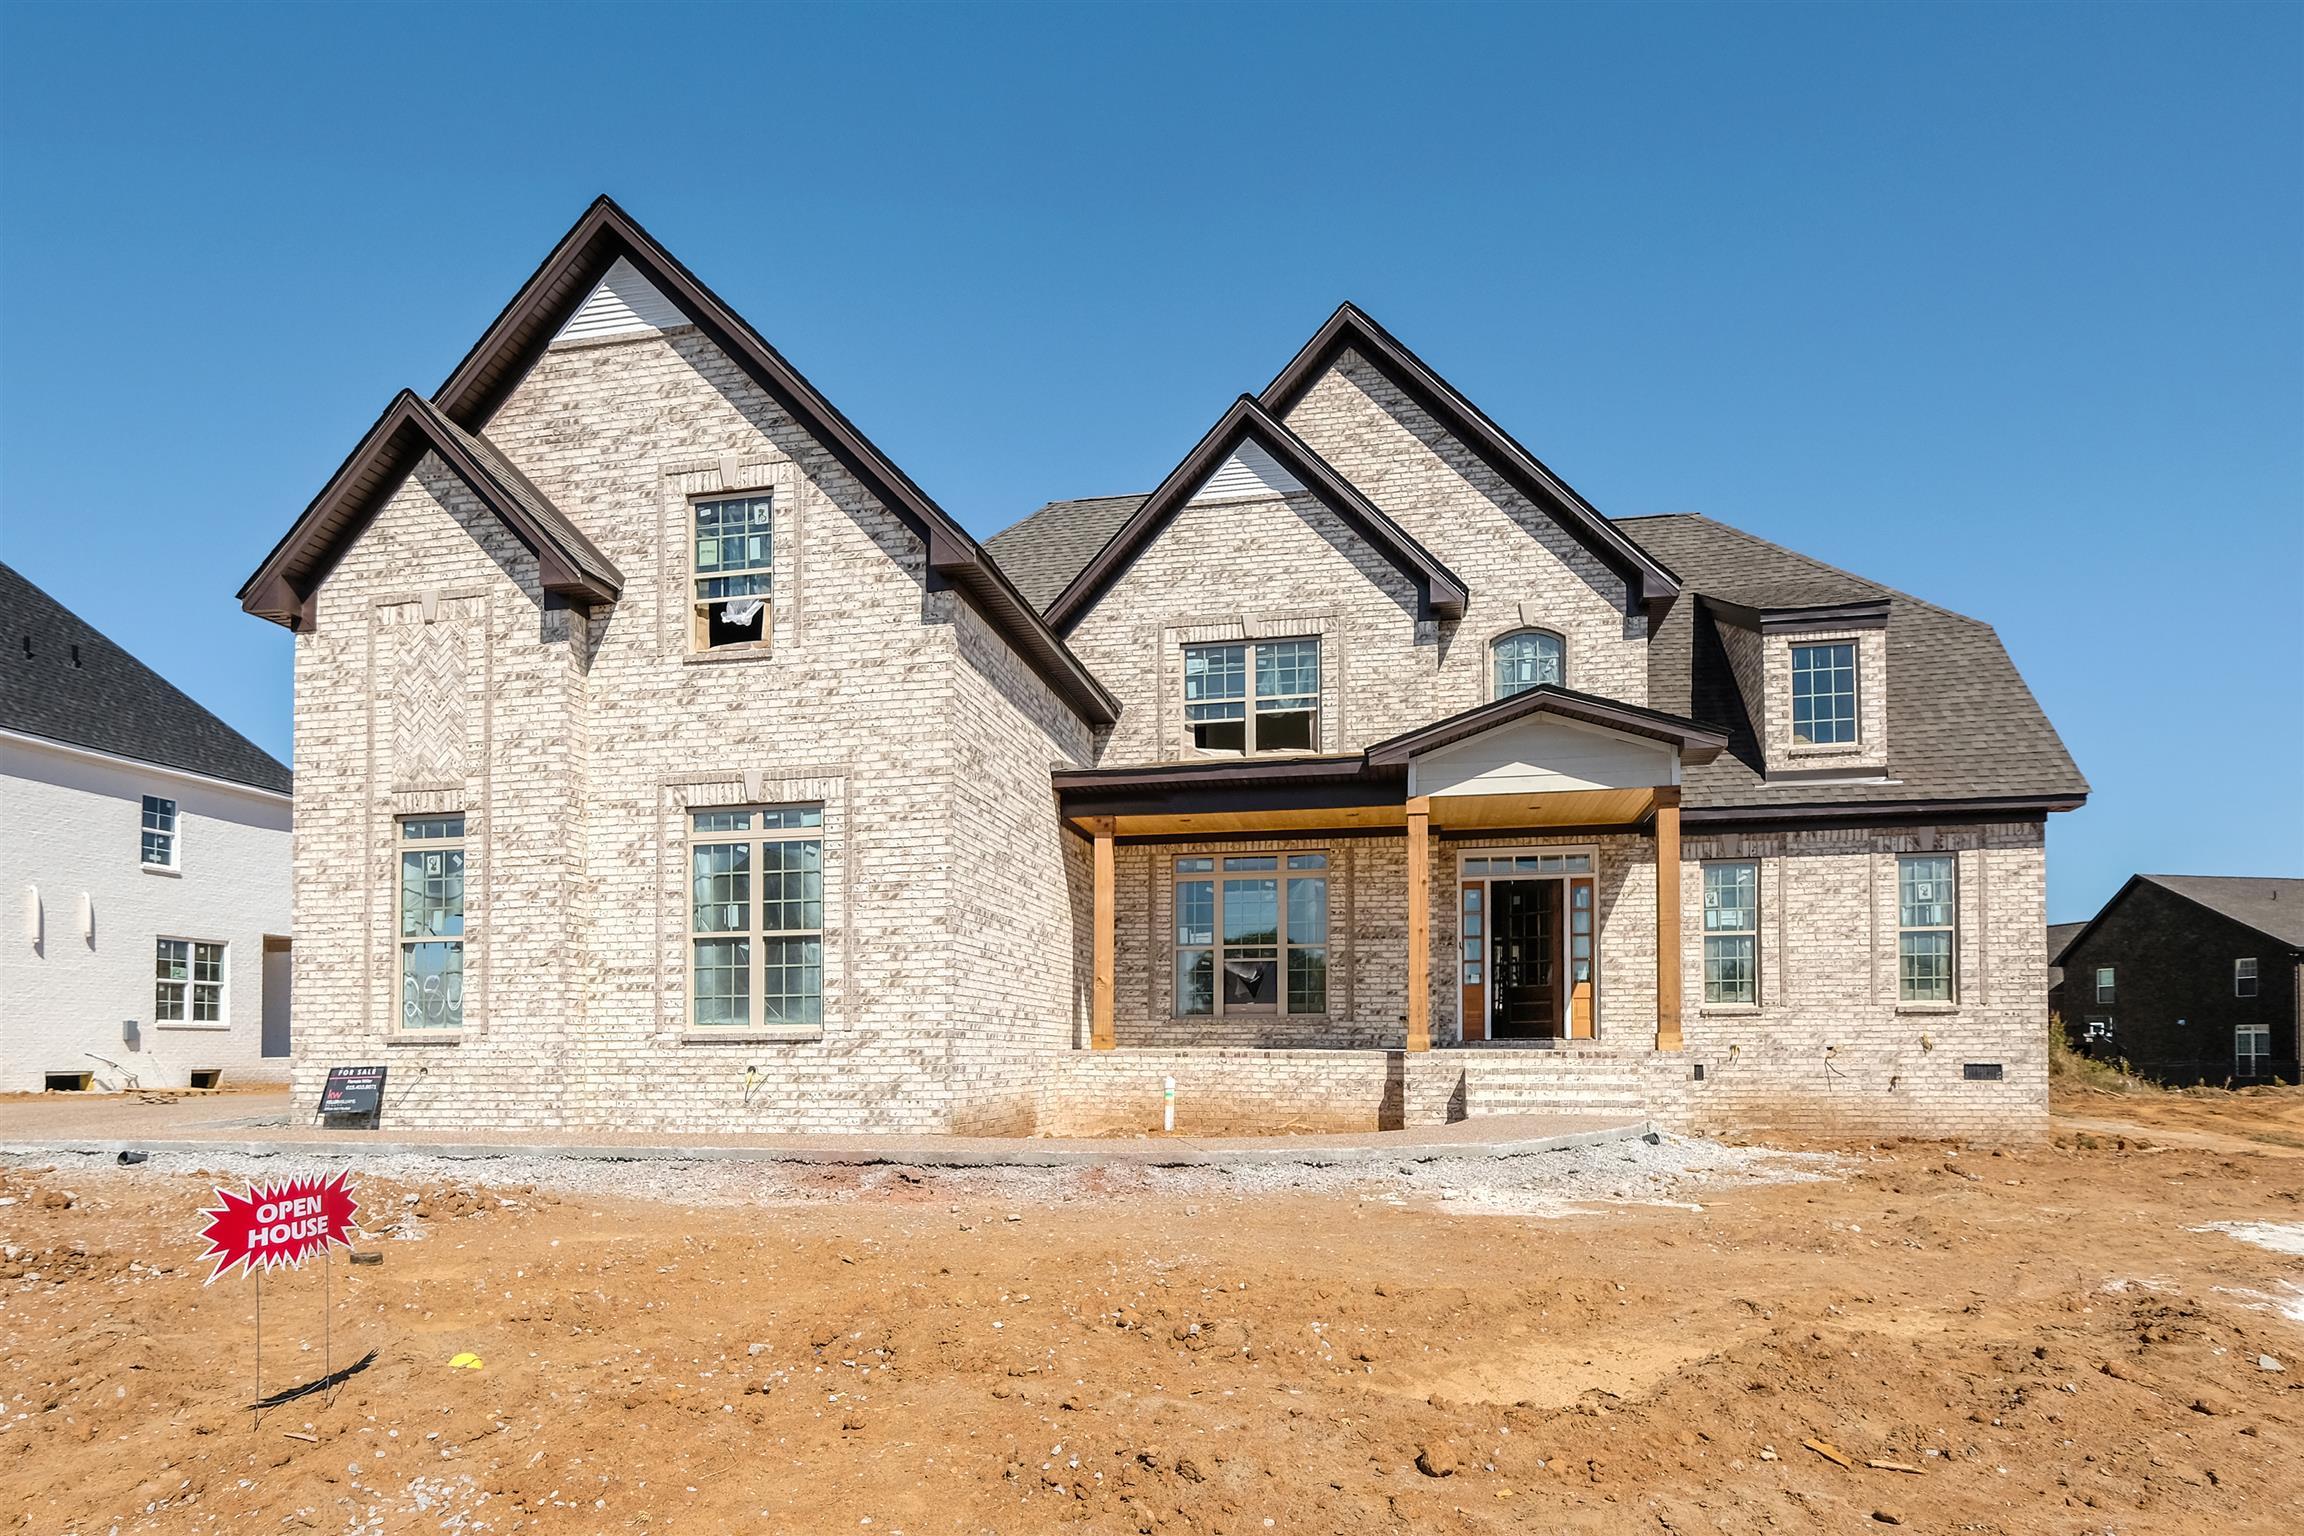 2042 Autumn Ridge Way (Lot 280), Spring Hill, TN 37174 - Spring Hill, TN real estate listing